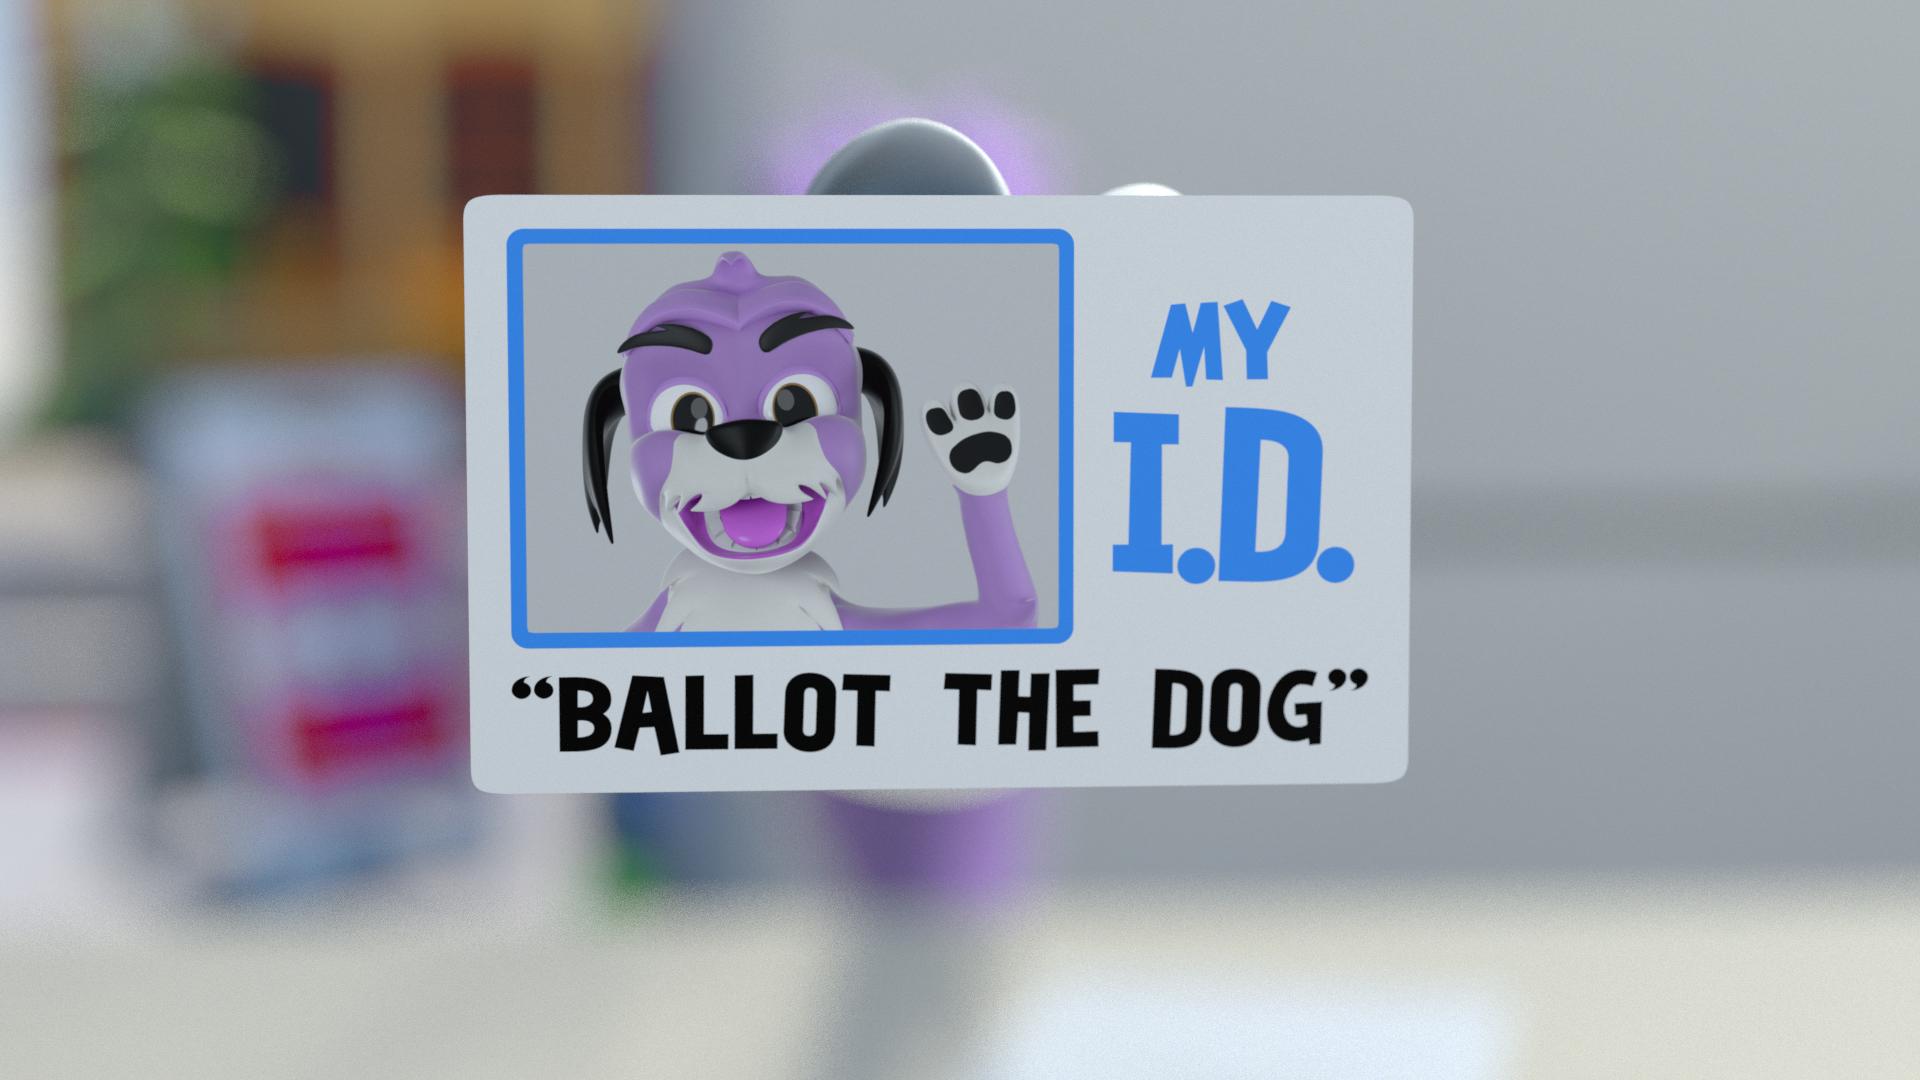 BALLOT THE DOG